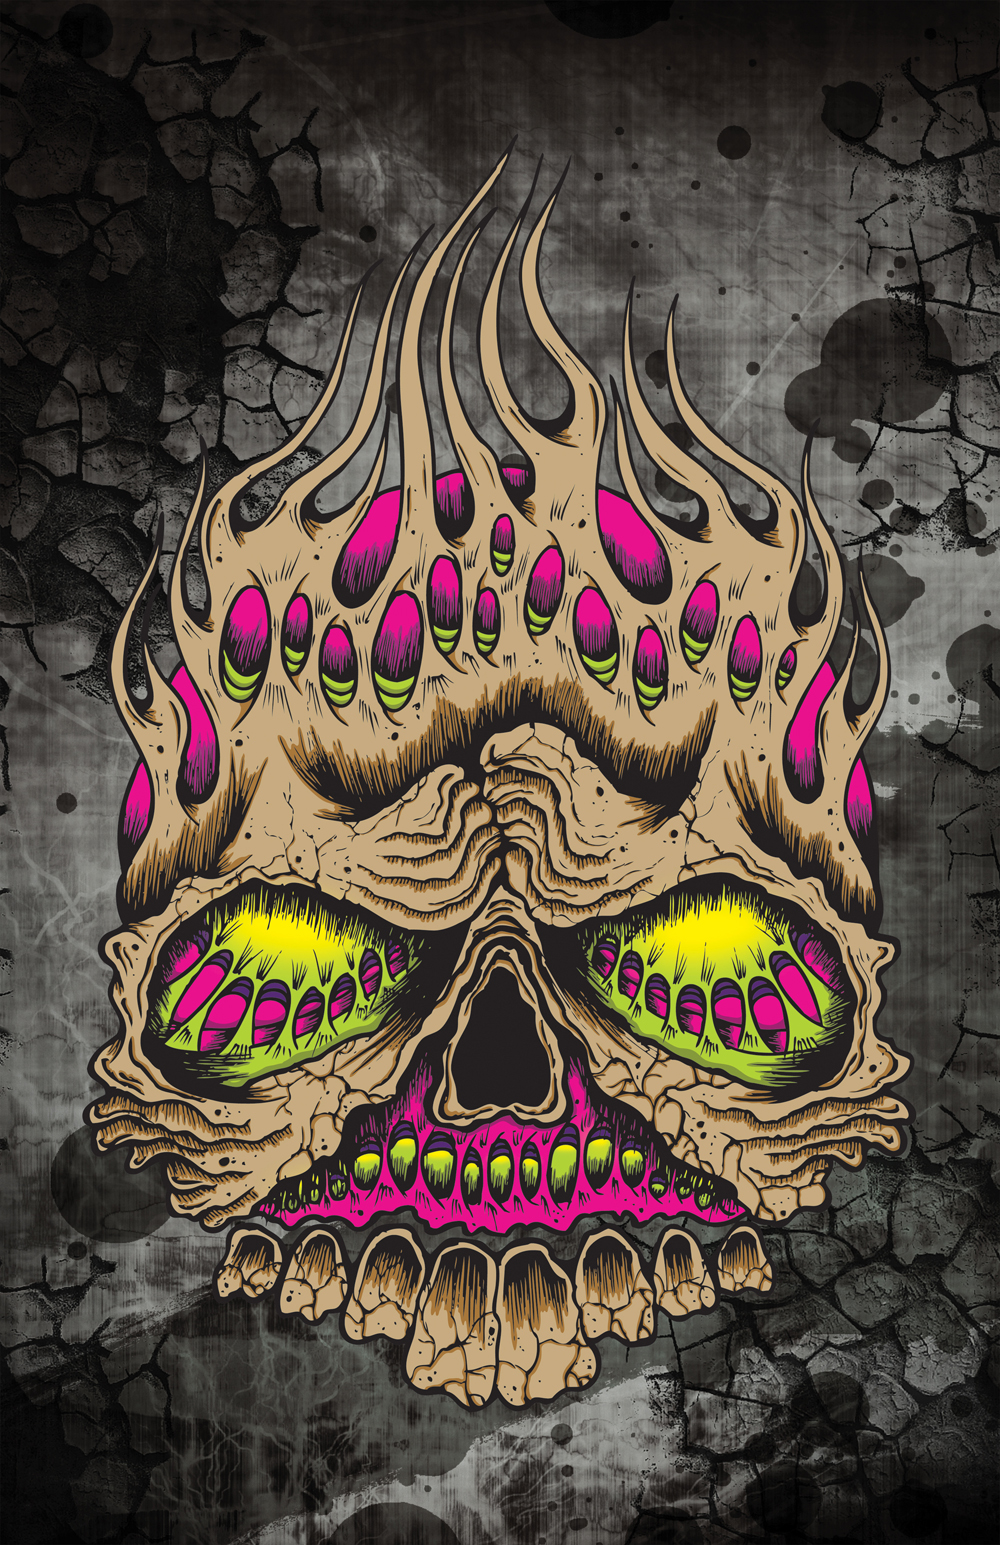 skull_flame_poster copy.jpg